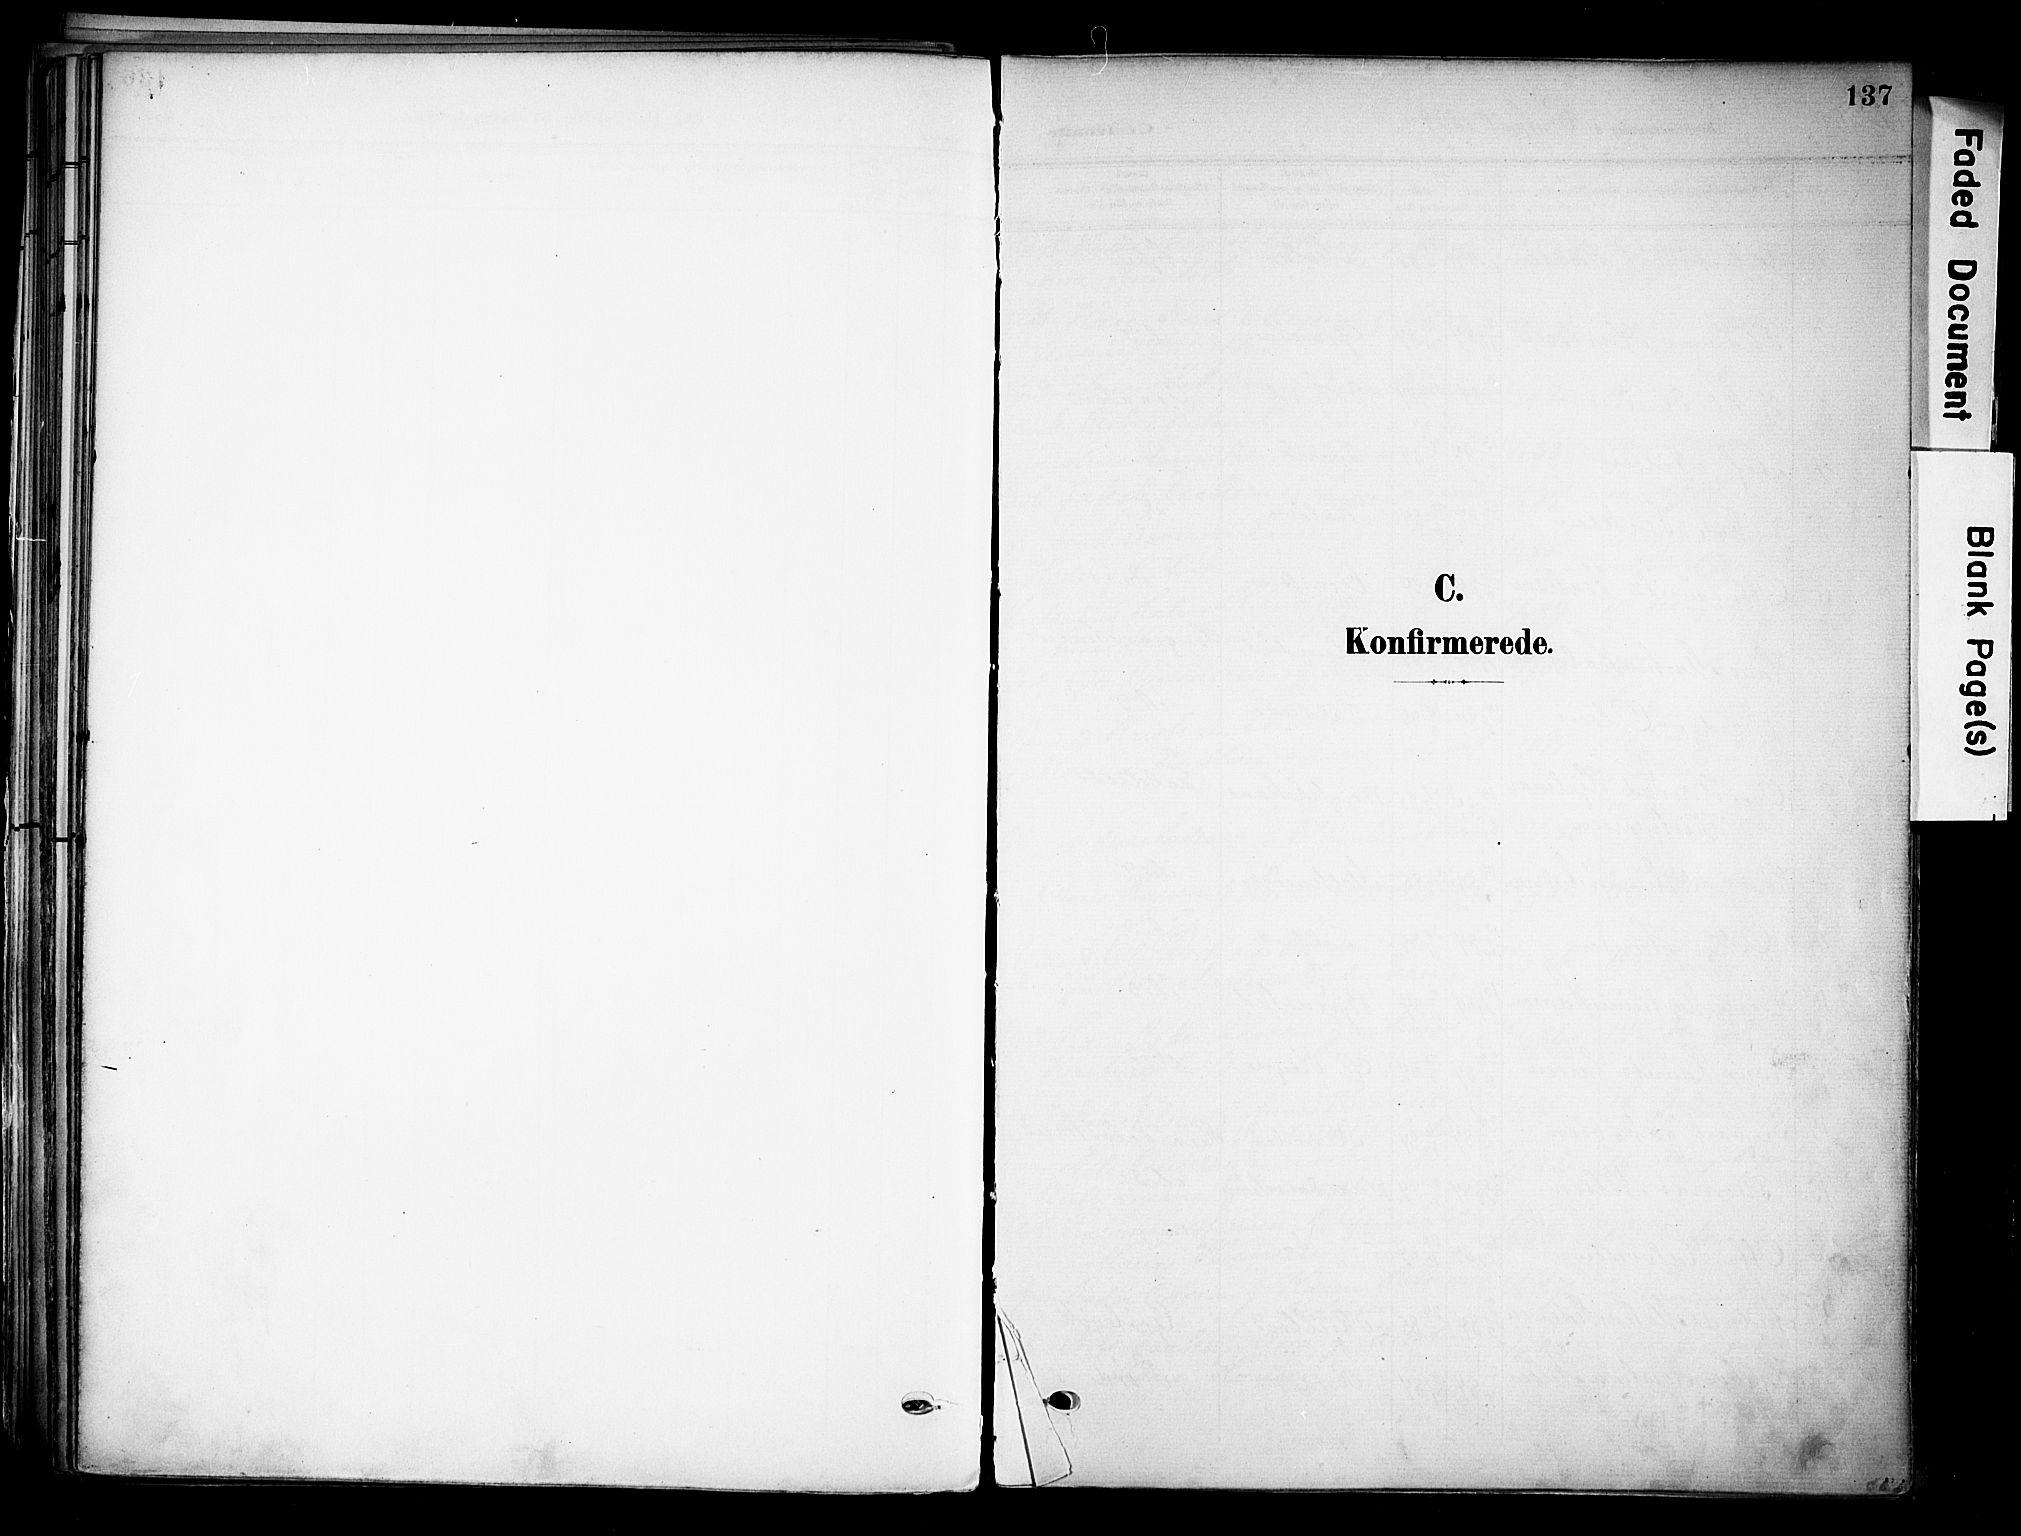 SAKO, Solum kirkebøker, F/Fa/L0011: Ministerialbok nr. I 11, 1898-1909, s. 137